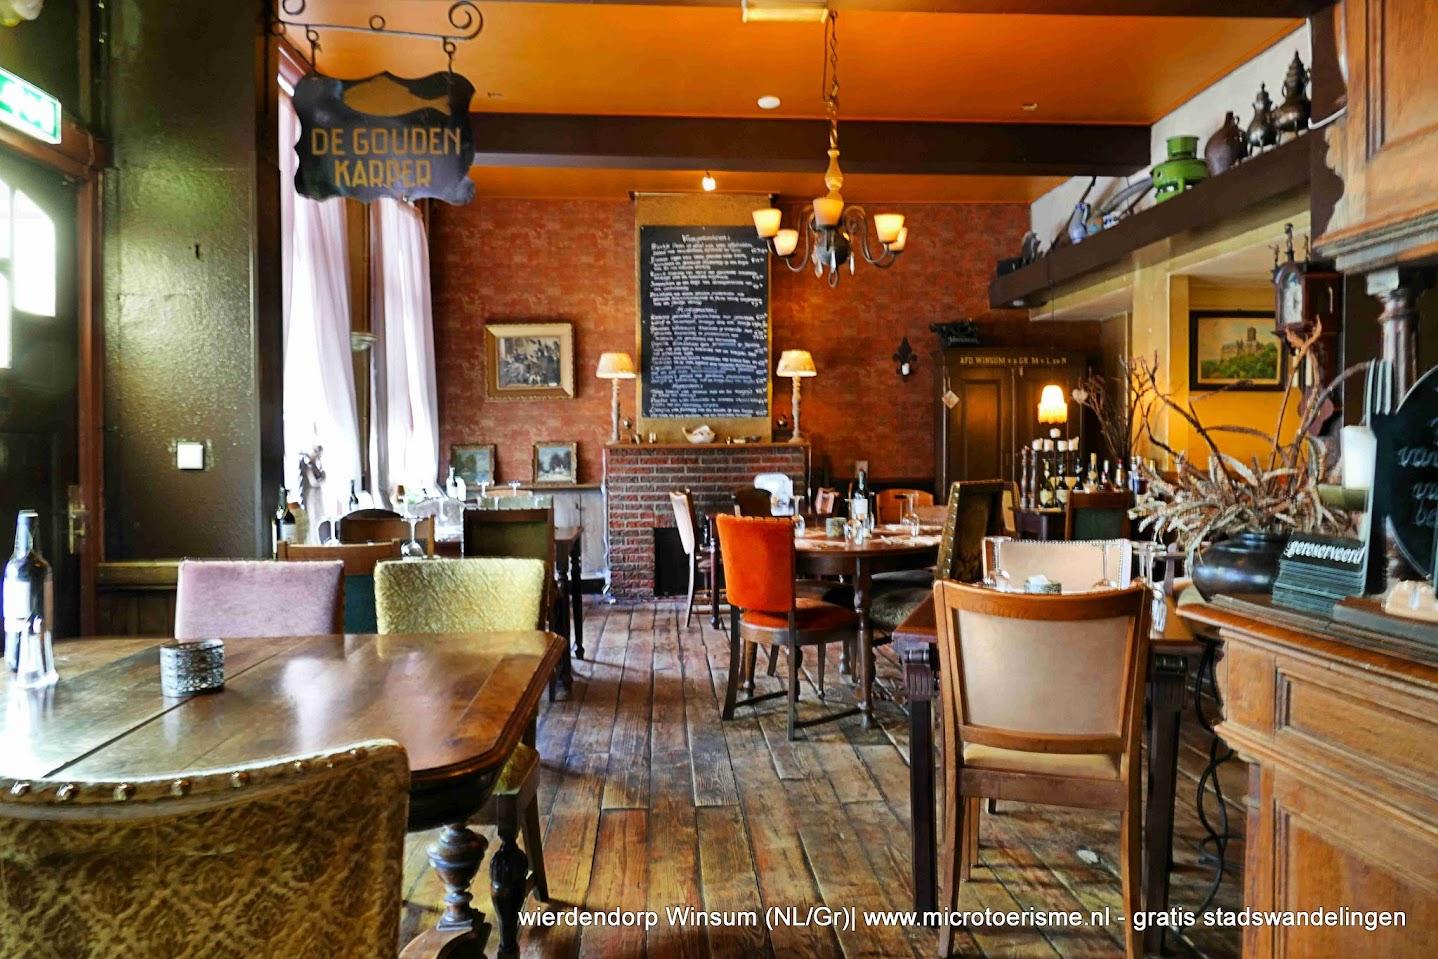 Aangeboden door: Stichting Microtoerisme InZicht Fotoblog Winsum Gouden Gulden Karper café restaurant herberg oud 500